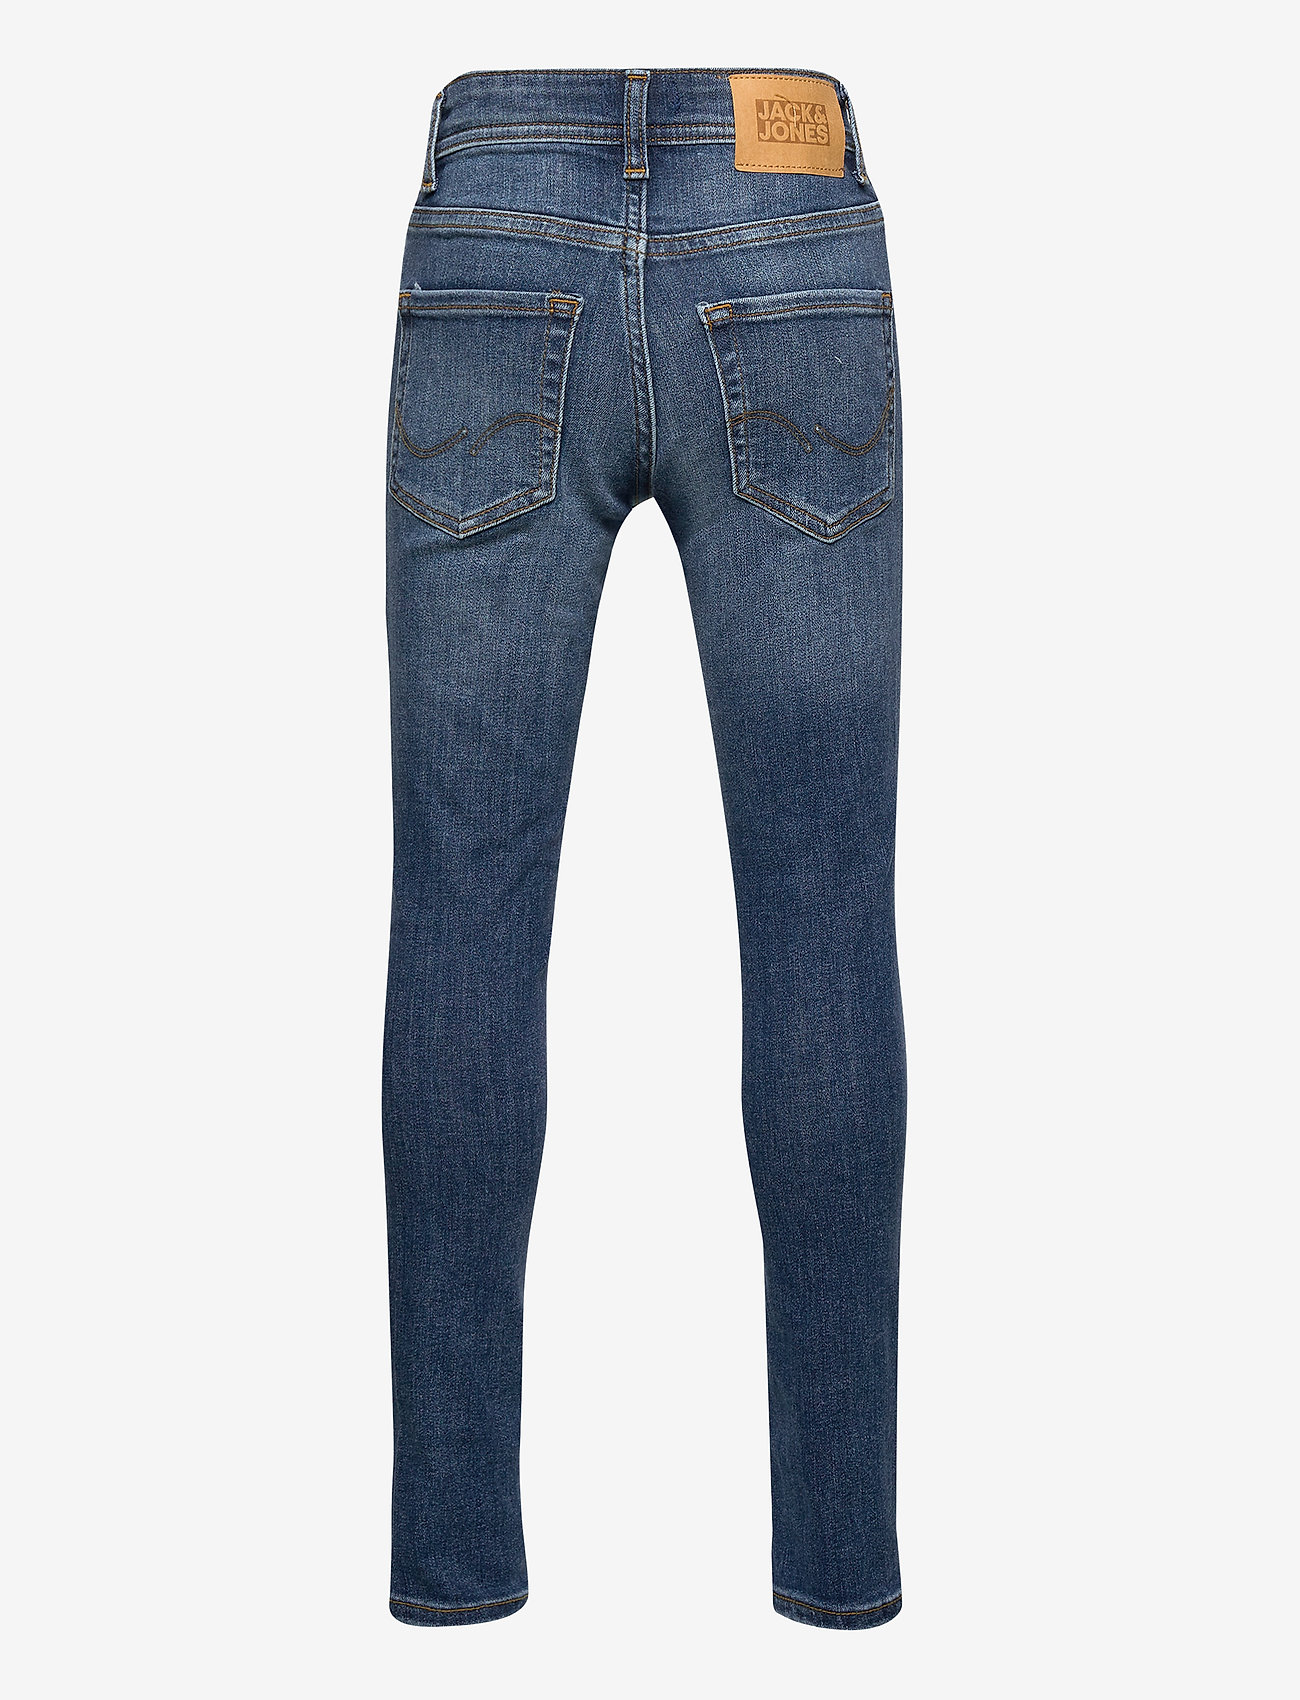 Jack & Jones - JJIGLENN JJORIGINAL AM 814 NOOS JR - jeans - blue denim - 1